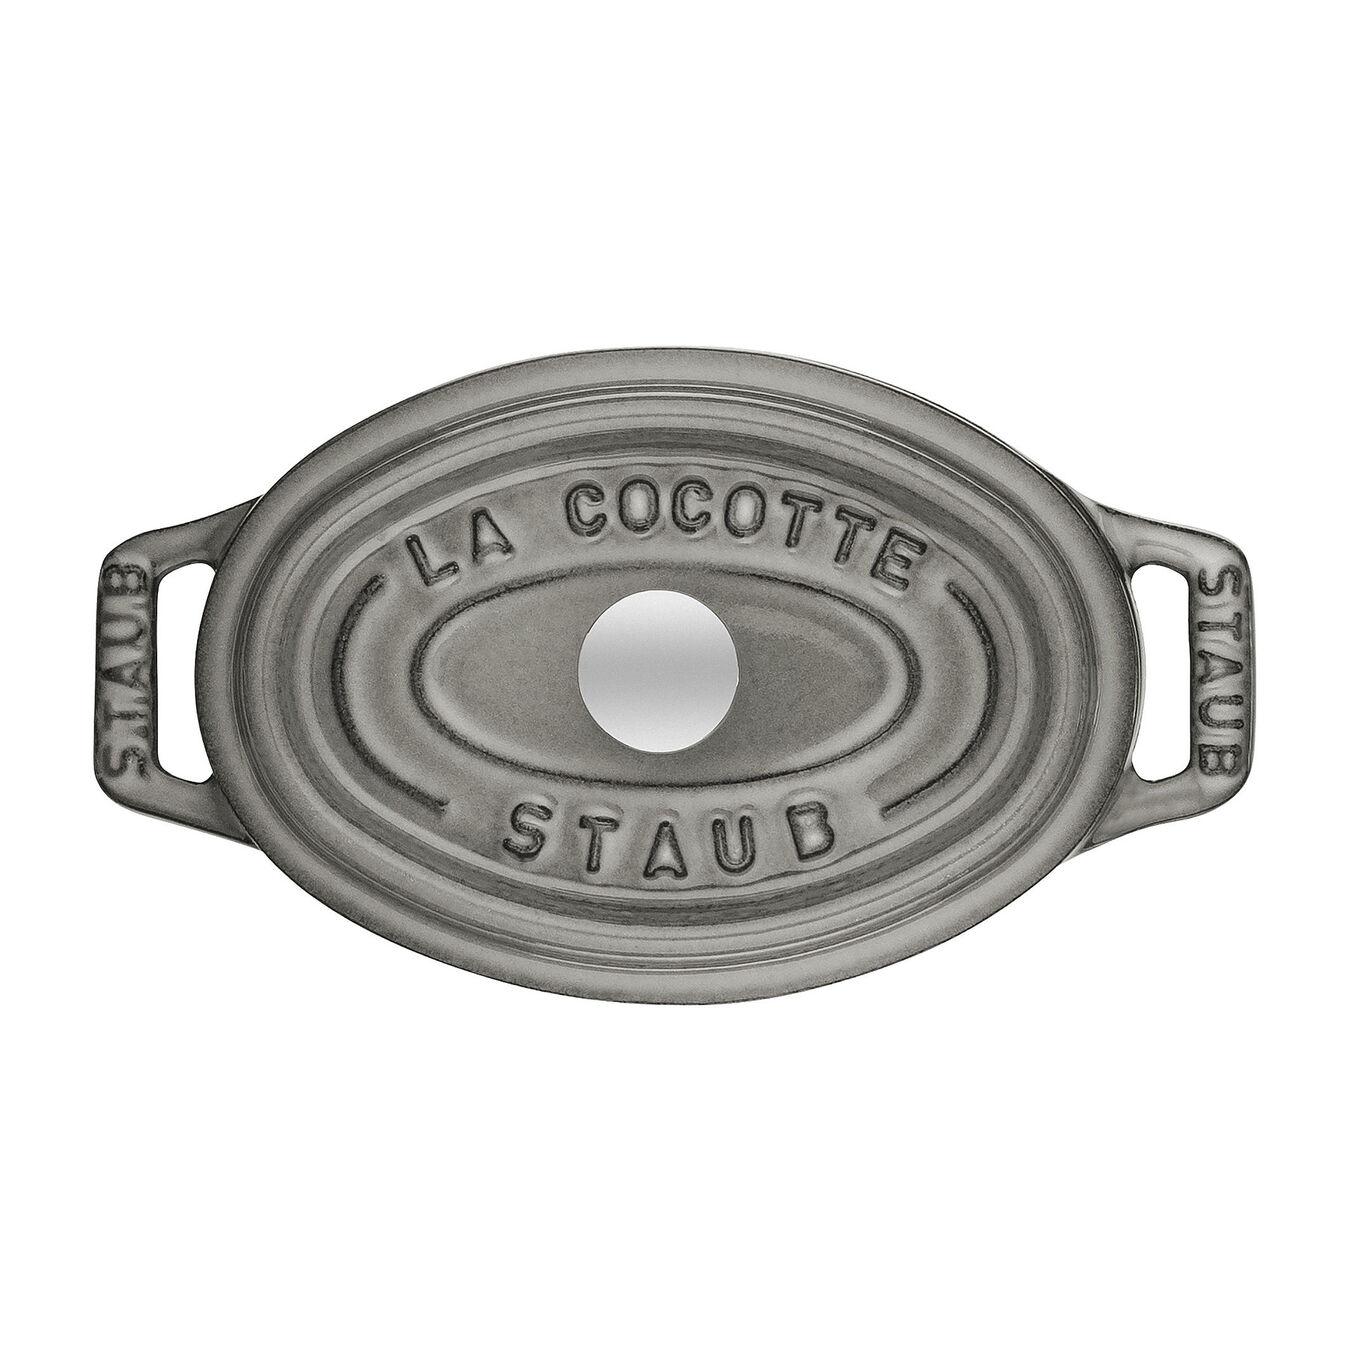 Mini cocotte ovale - 11 cm, grigio grafite,,large 2